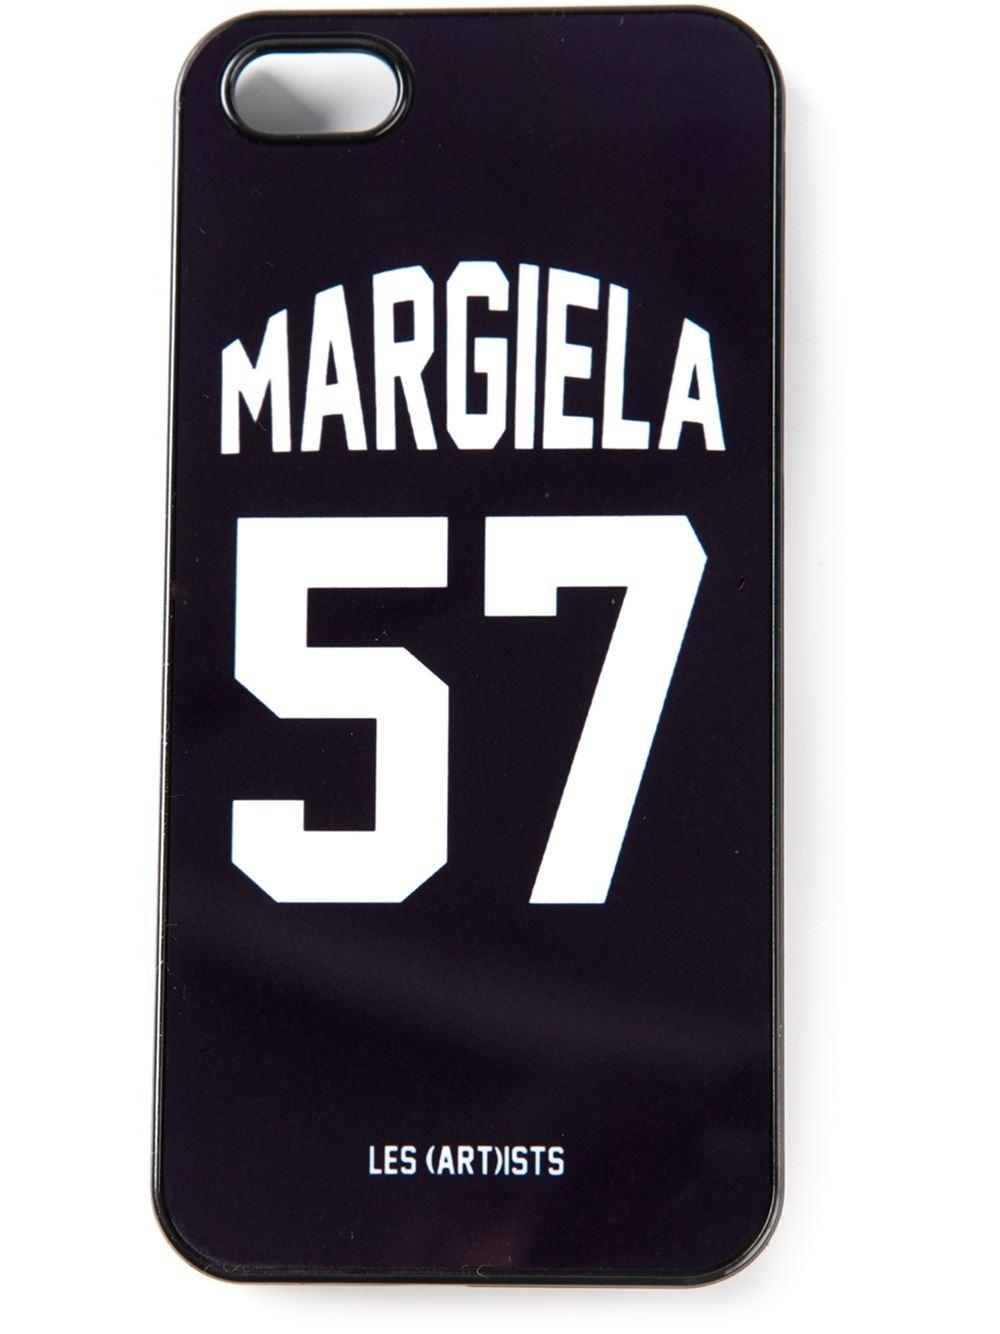 Les (art)ists 'margiela 57' iphone 5s case